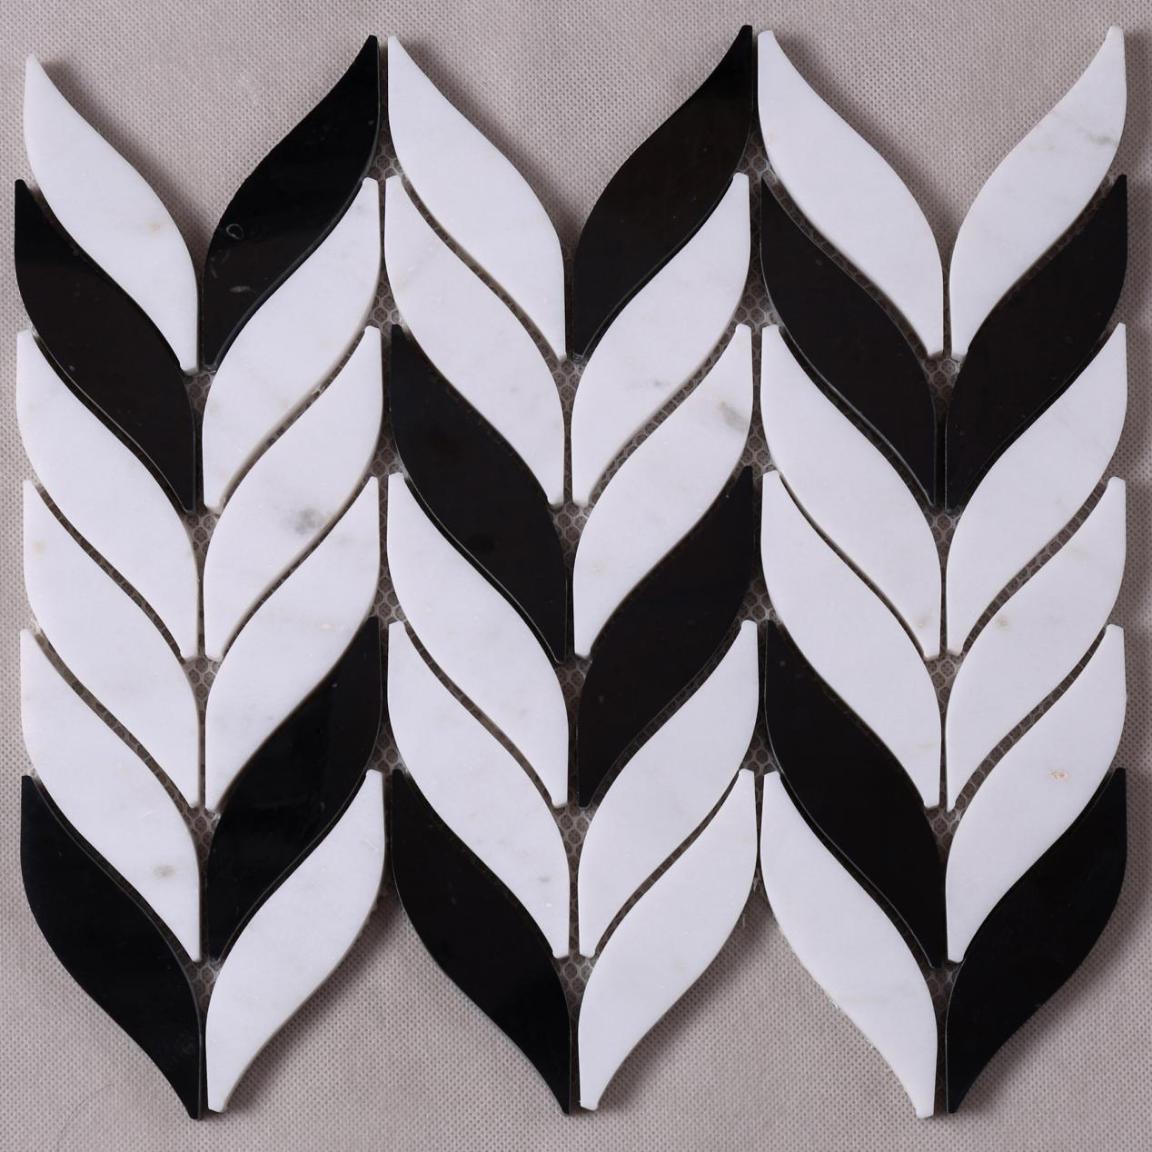 Heng Xing Custom glass stone mosaic manufacturers for bathroom-1